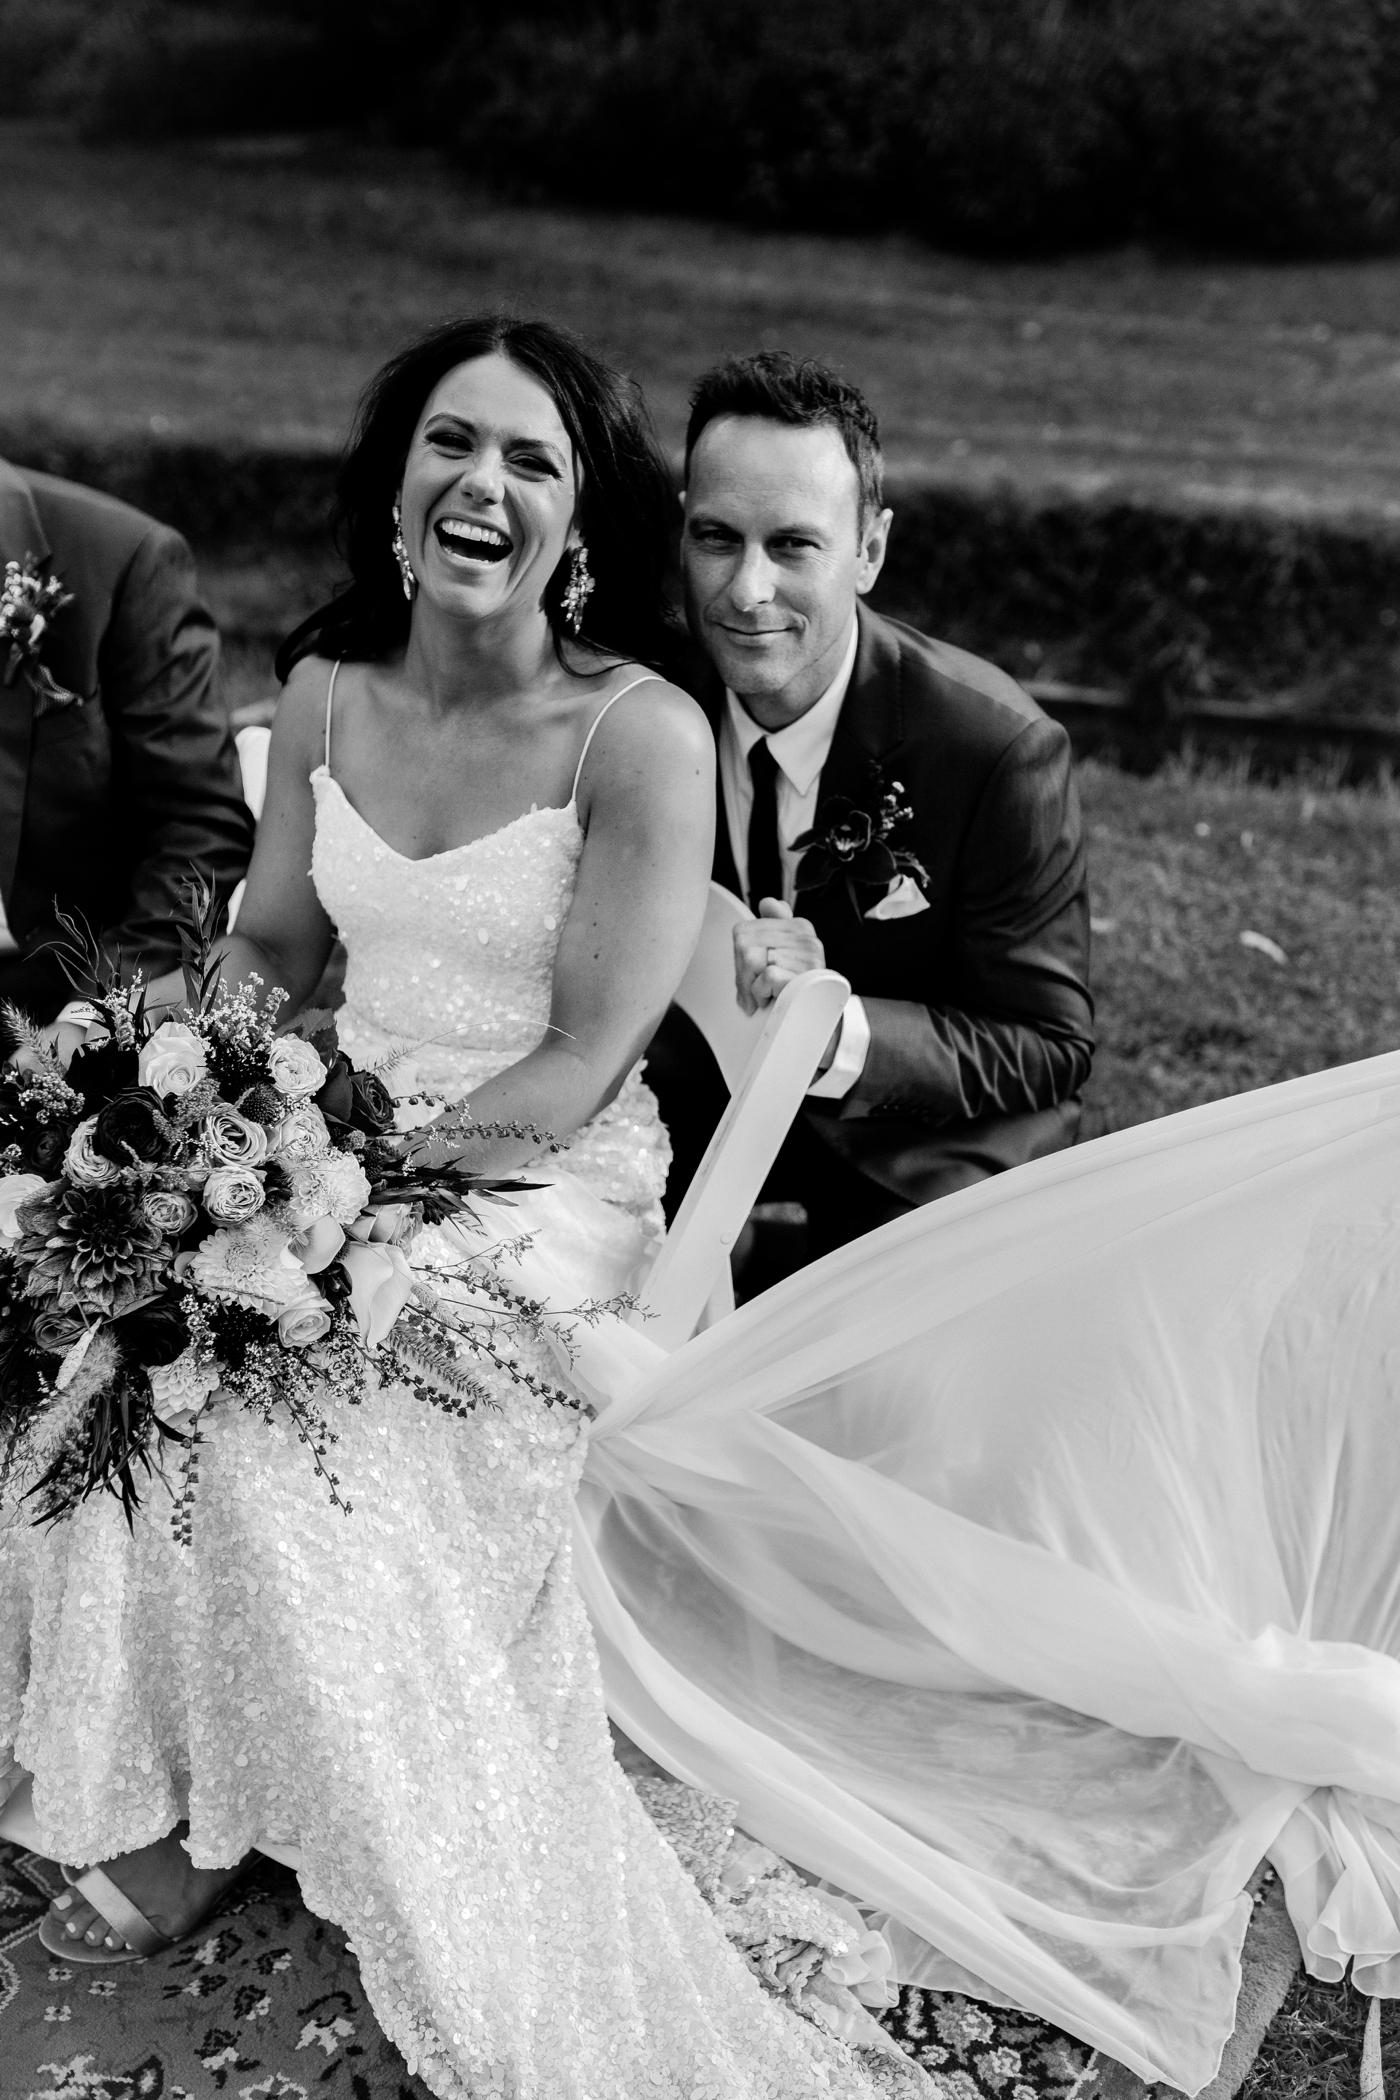 Kellie & Brent - Adelaide City Wedding - Natural wedding photography in Adelaide - Katherine Schultz - www.katherineschultzphotography.com 46